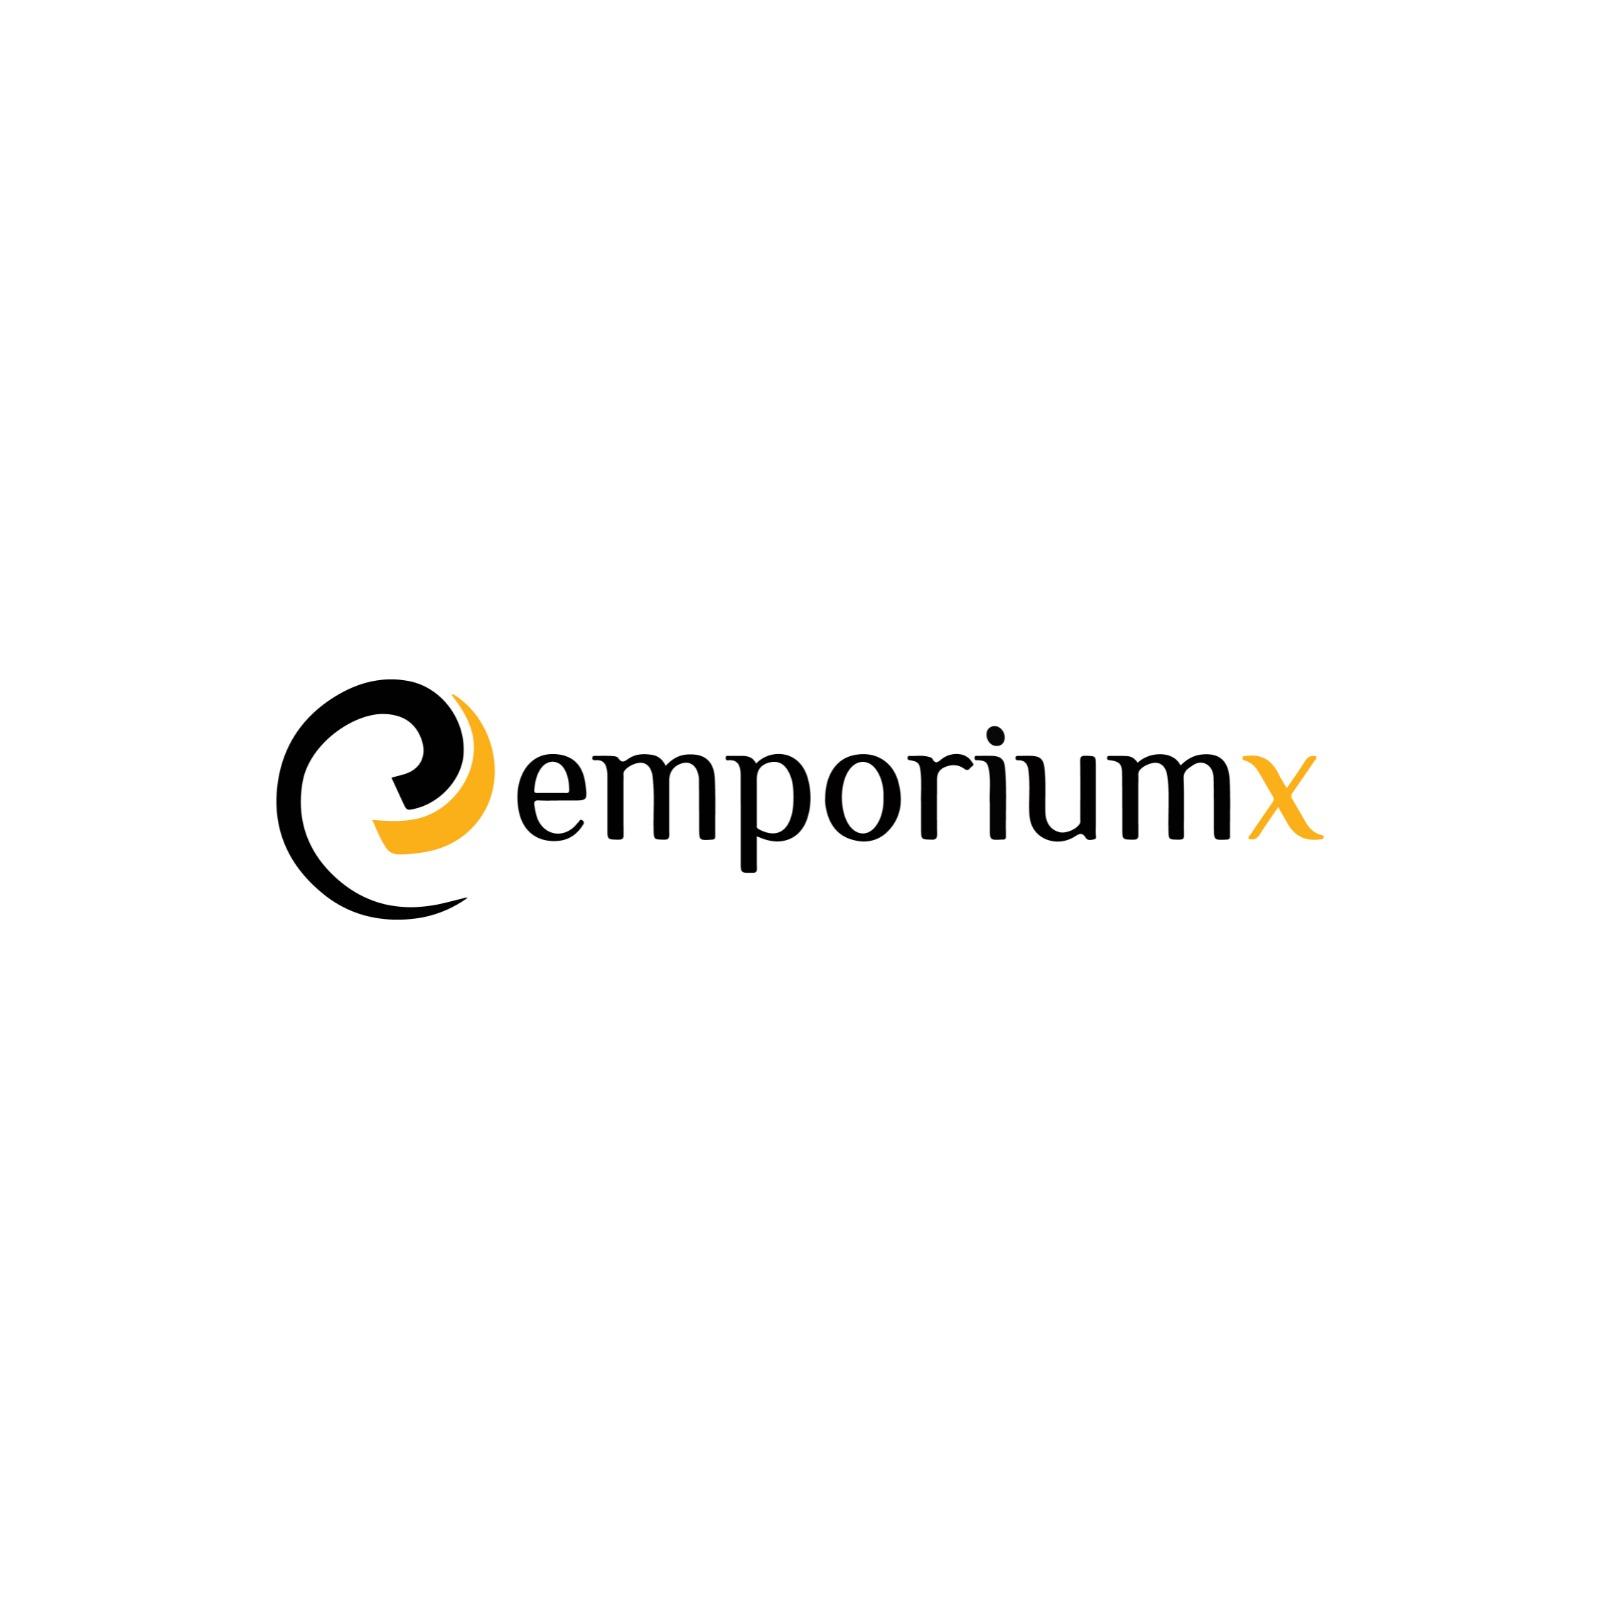 """Emporiumx"" kripto para borsasında yerini aldı"